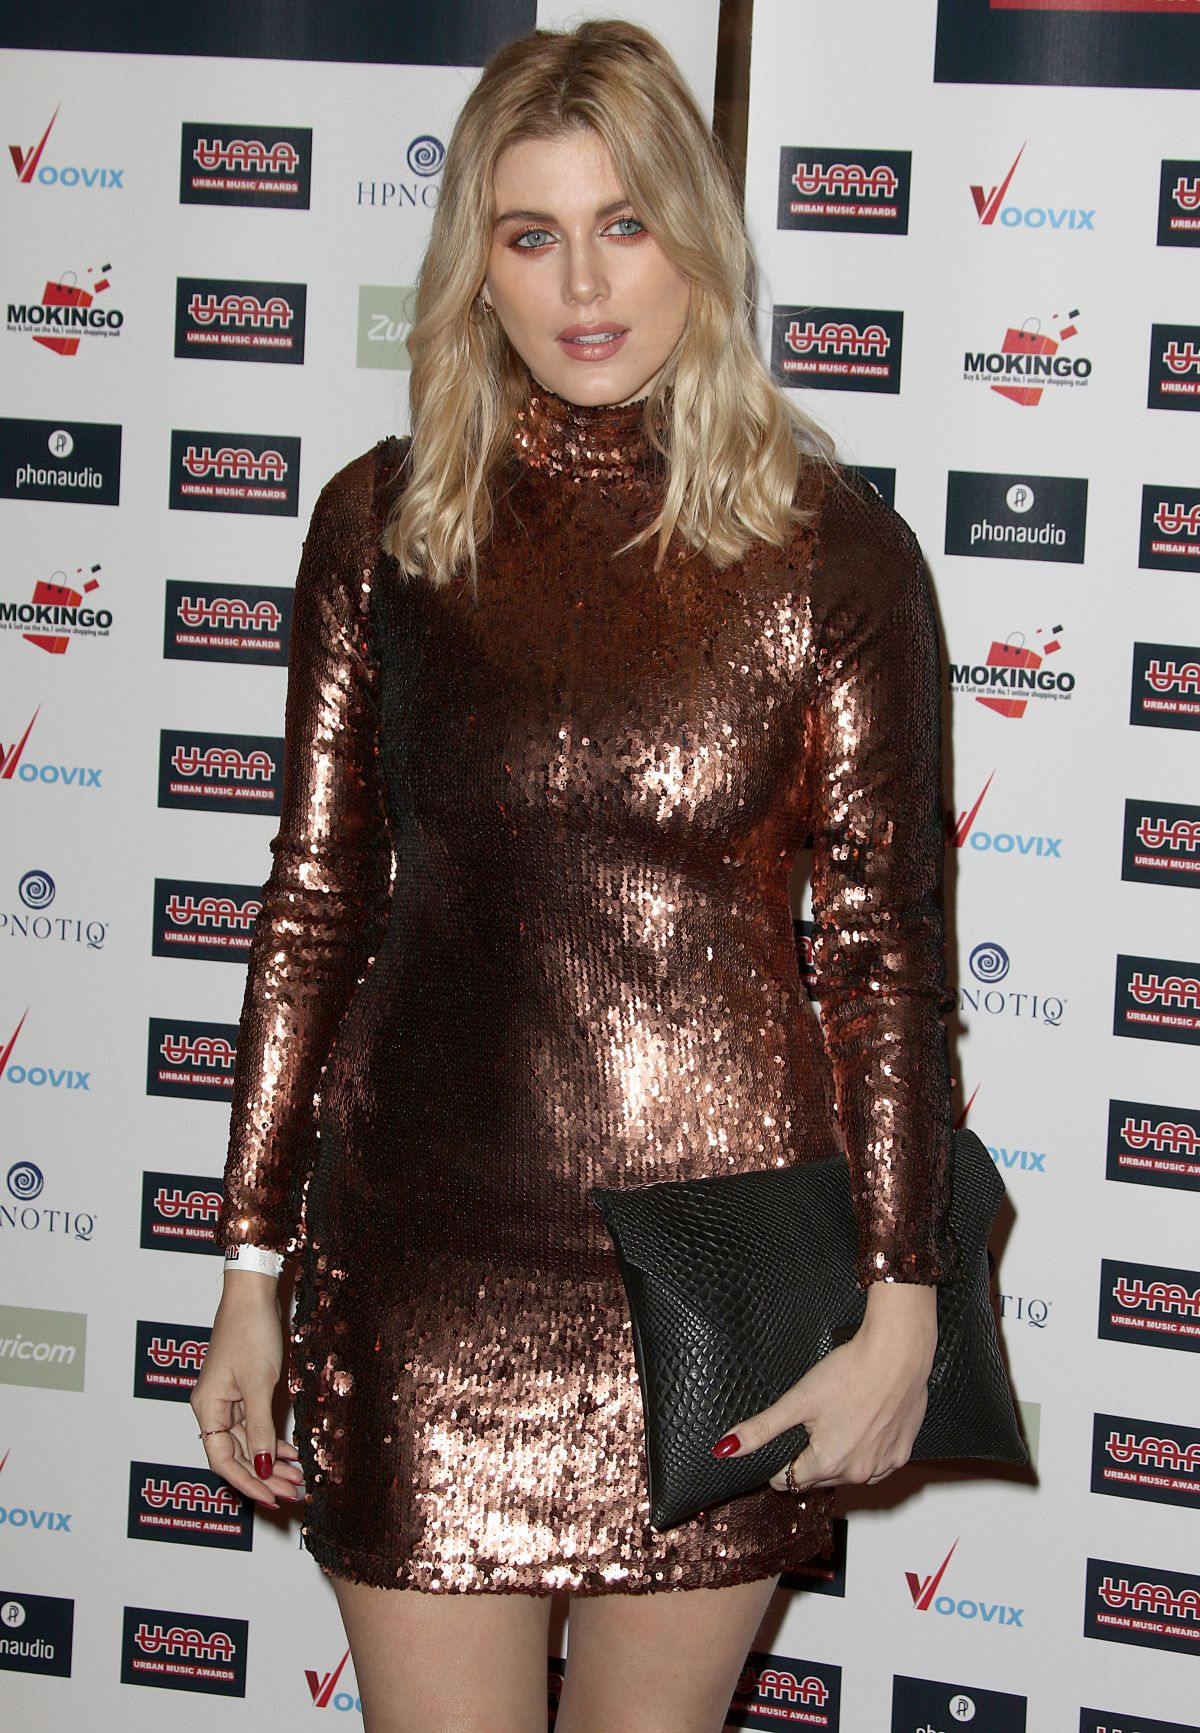 ASHLEY JAMES at Urban Music Awards 2016 in London 11/26/2016